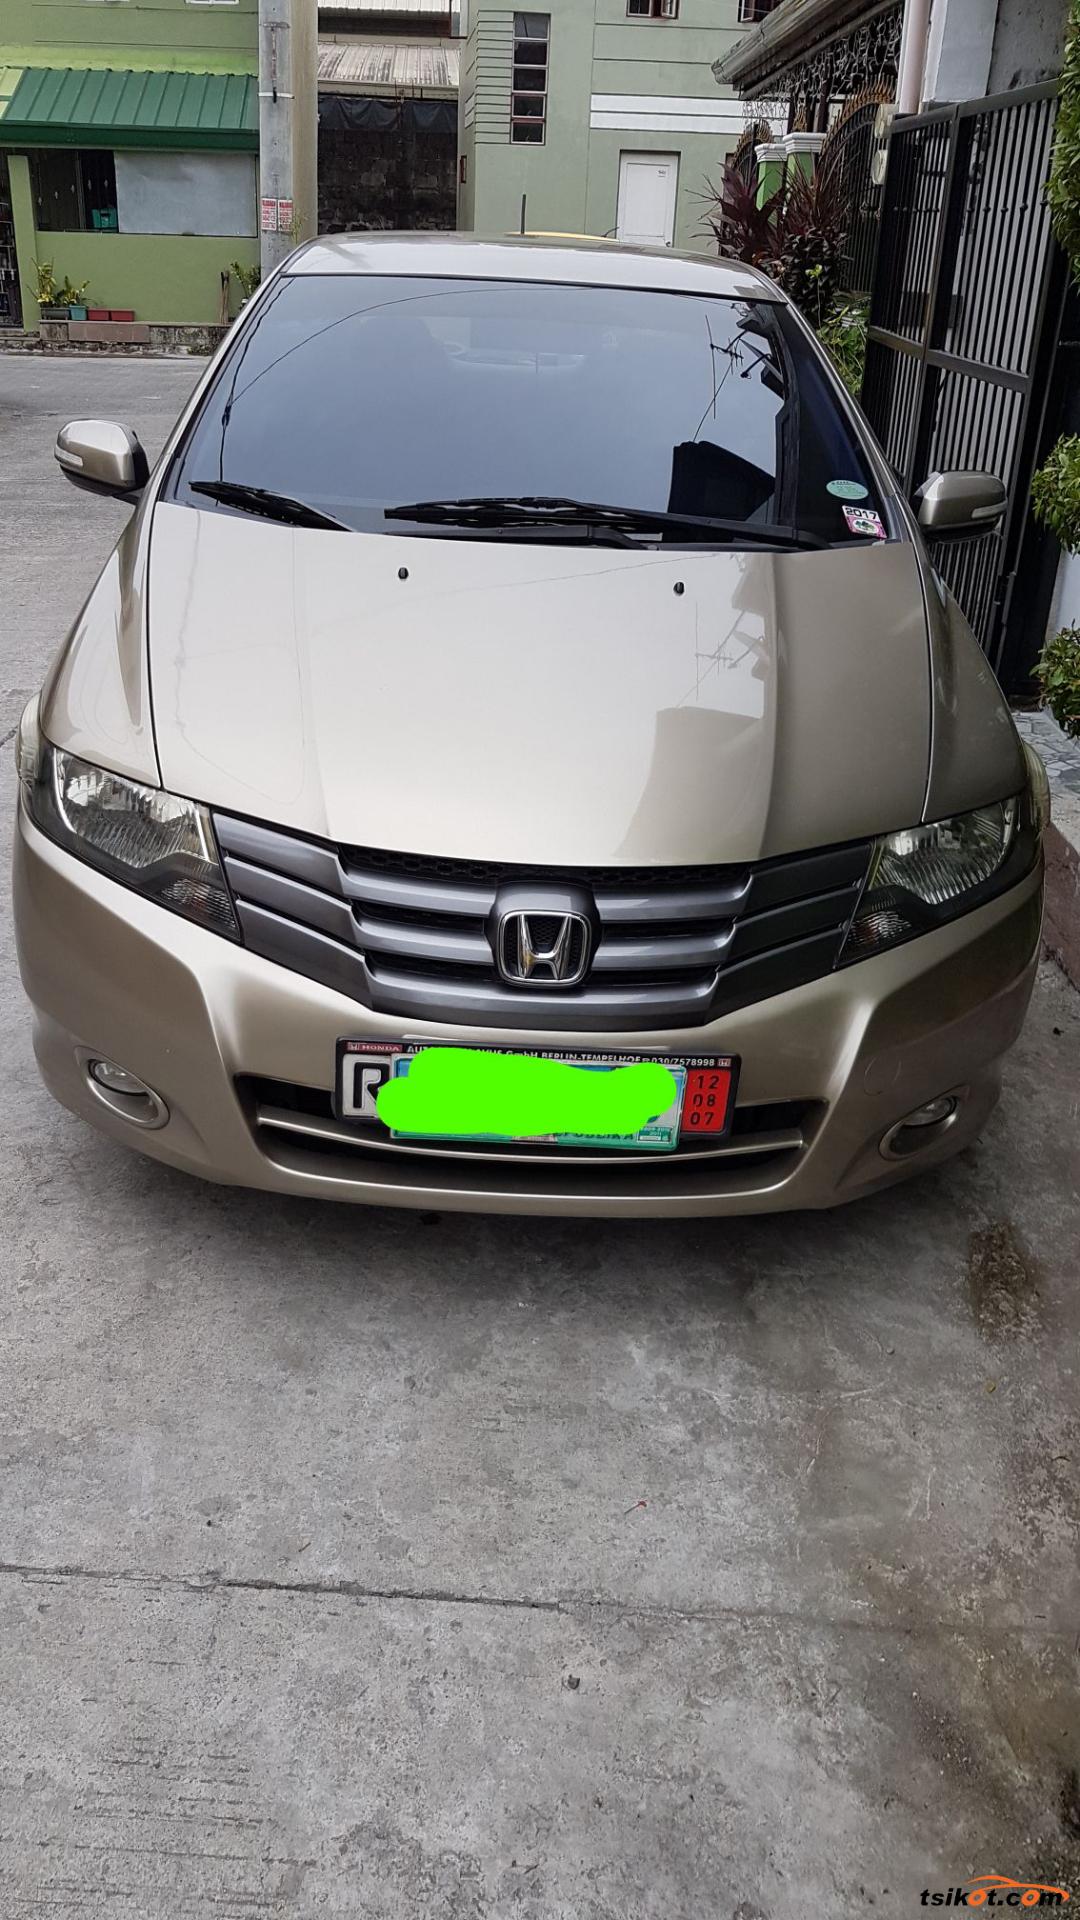 Honda City 2010 - Car for Sale Metro Manila